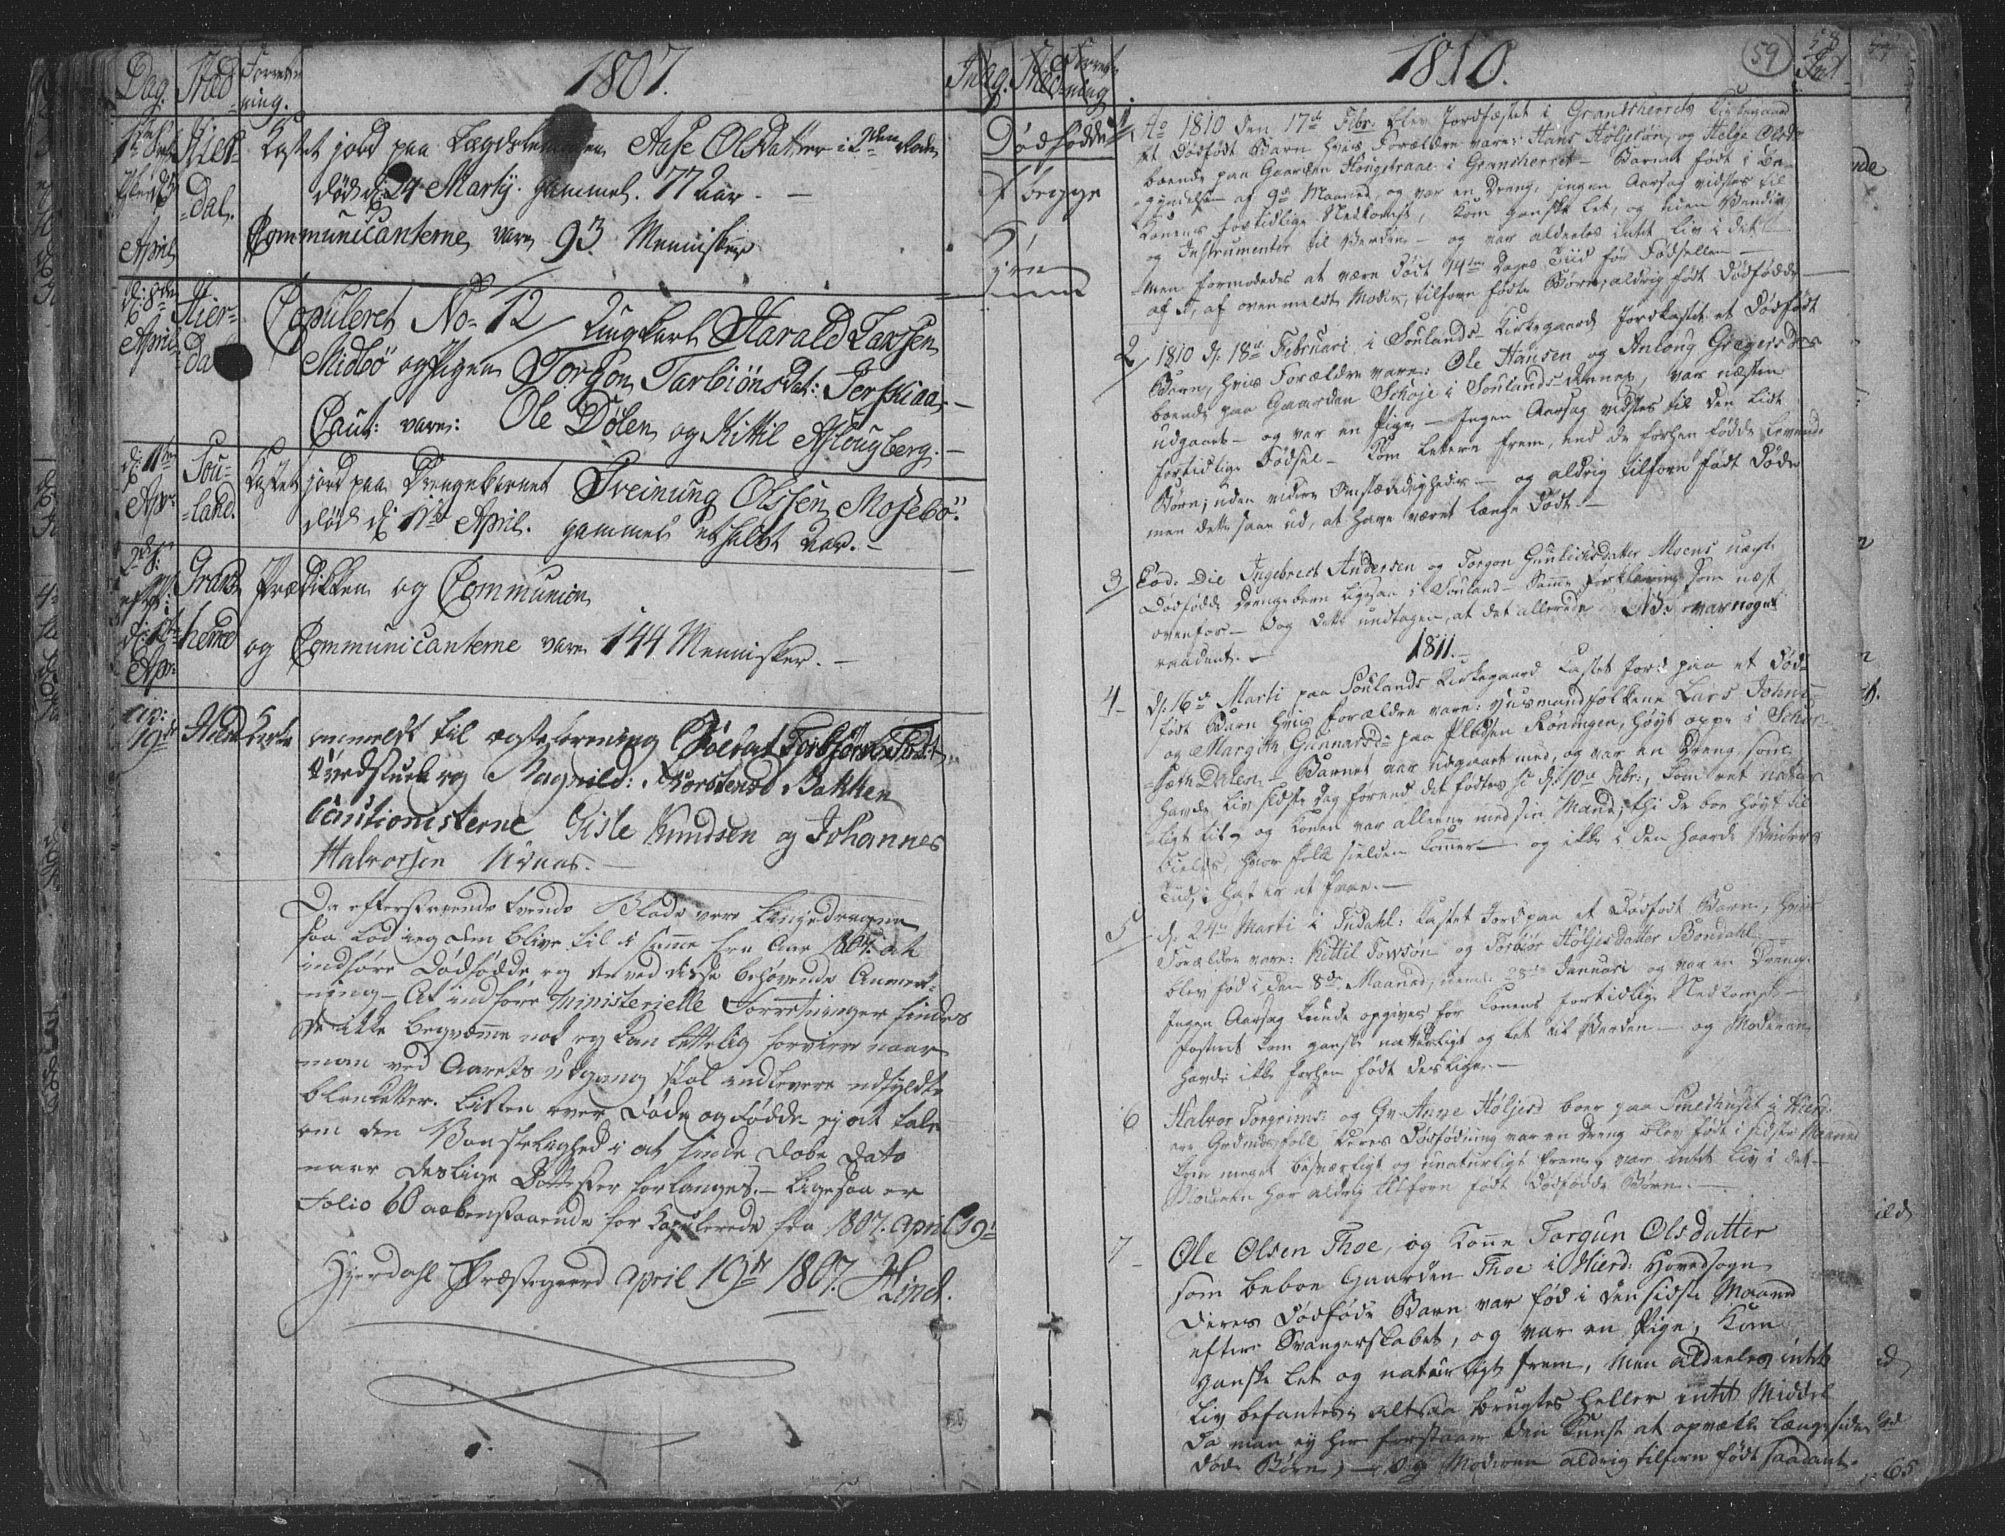 SAKO, Hjartdal kirkebøker, F/Fa/L0006: Ministerialbok nr. I 6, 1801-1814, s. 59